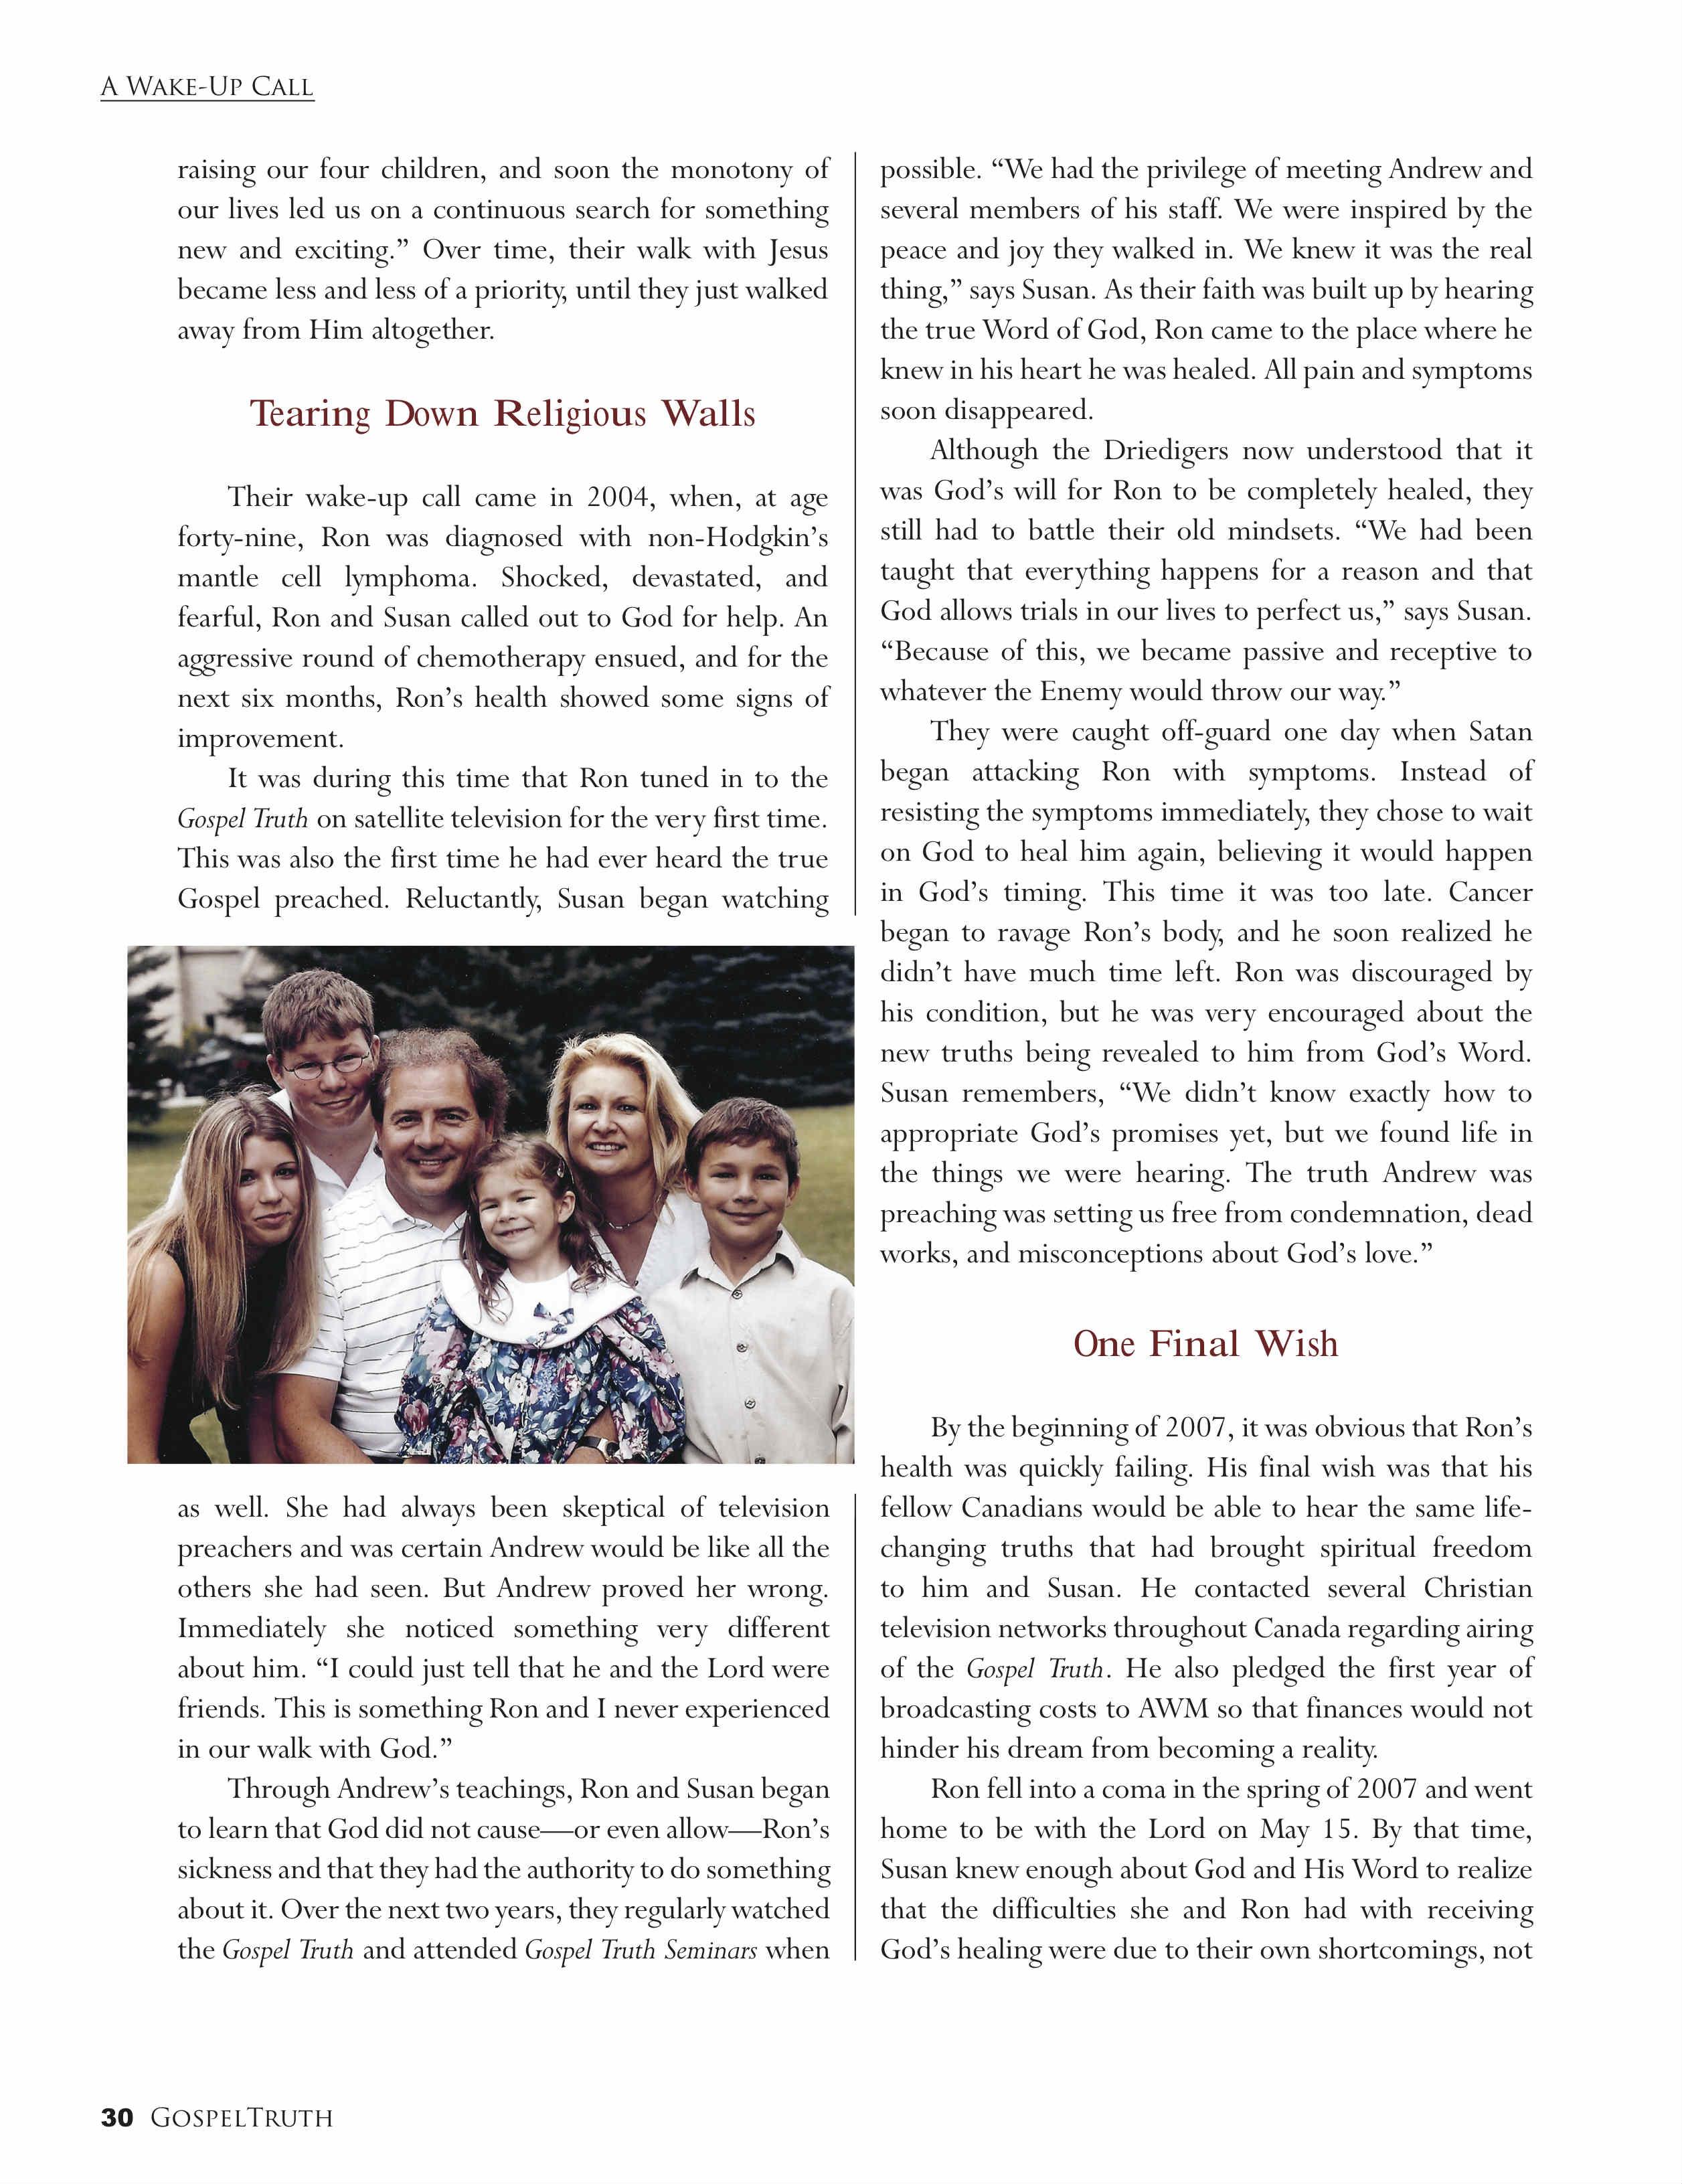 A Wake Up Call | Gospel Truth Magazine Spring/Summer 2009 | P 30